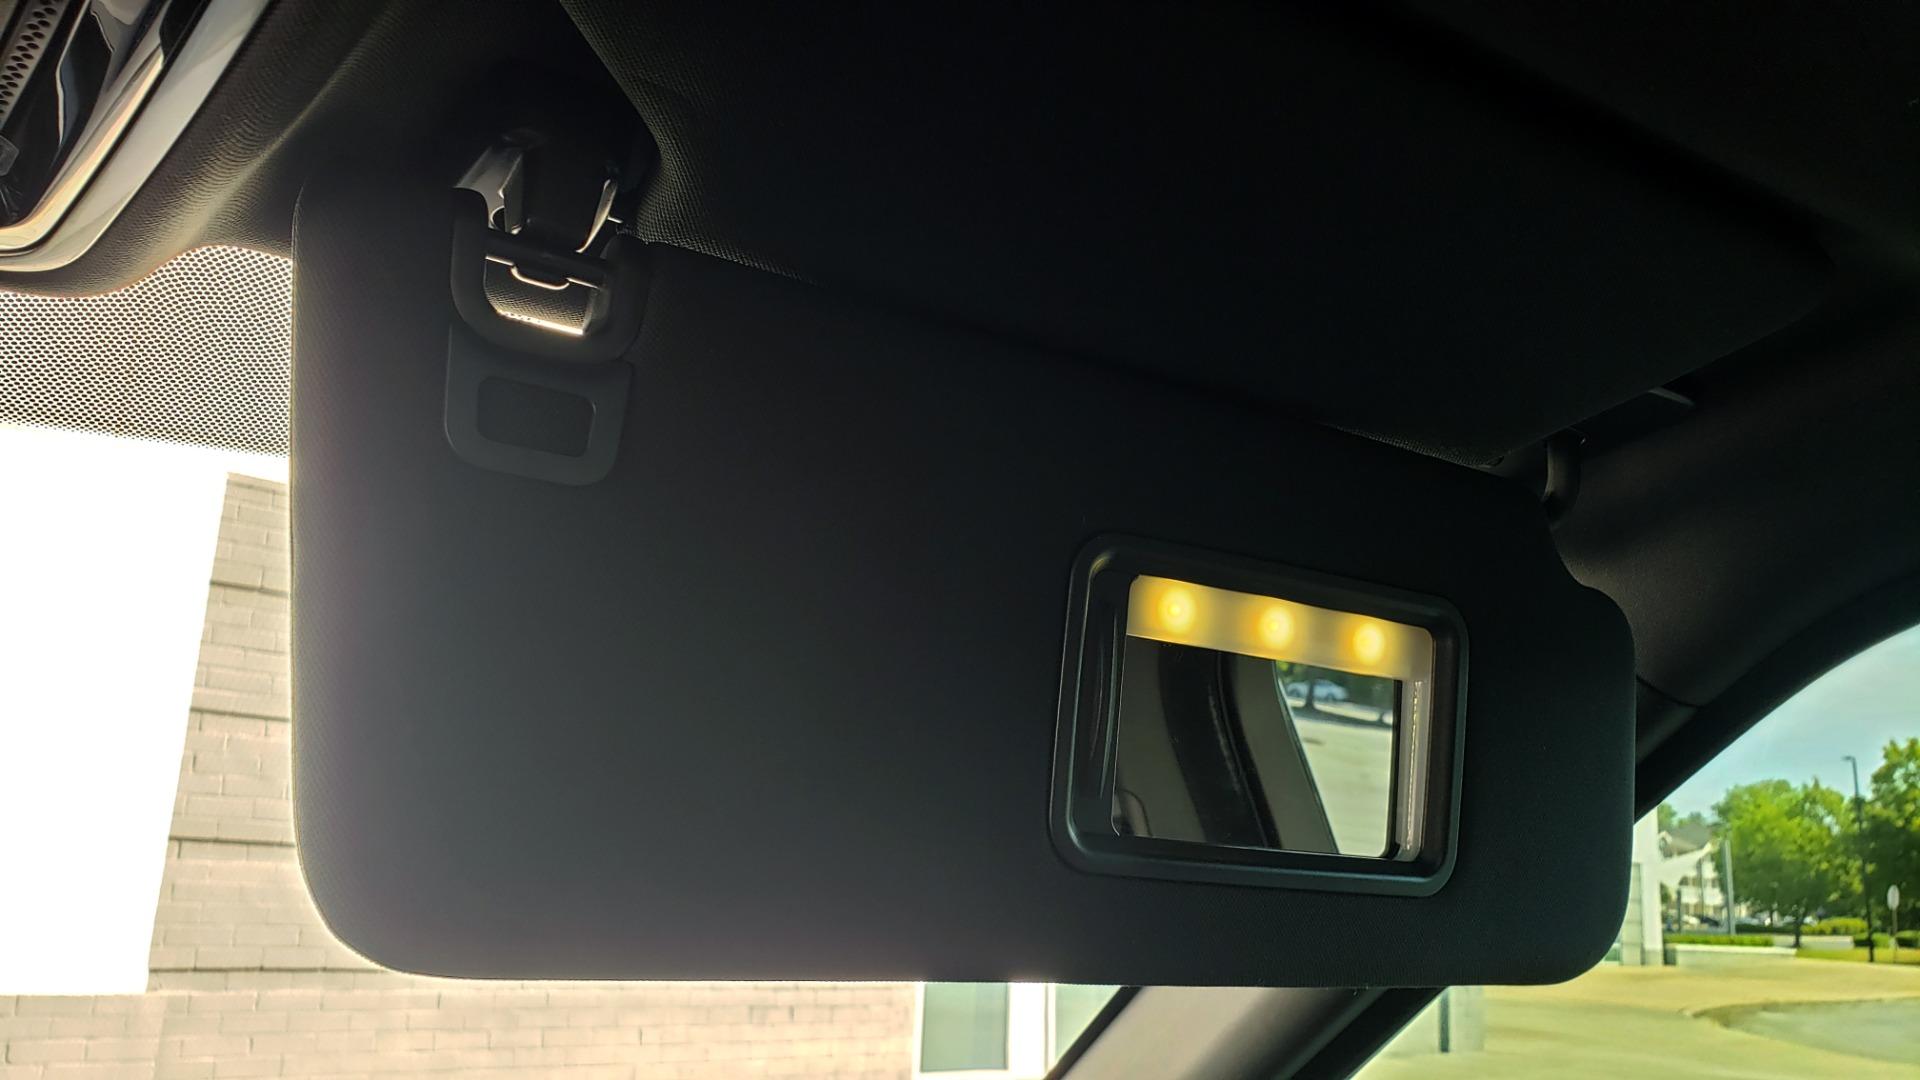 Used 2017 Land Rover RANGE ROVER SC V8 / VISION ASST / DRIVE PKG / MERIDIAN SOUND / PANO-ROOF / NAV / BSM for sale $75,995 at Formula Imports in Charlotte NC 28227 60